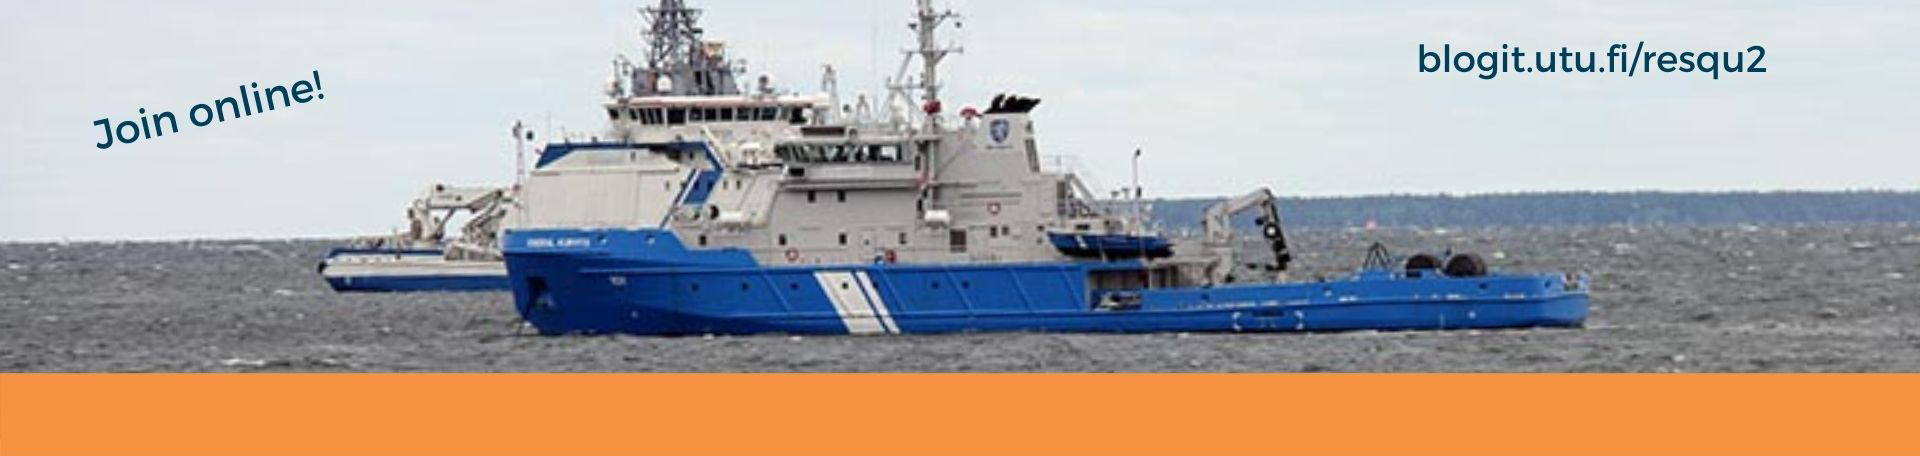 Maritime Rescue Operations webinar on 17 February 2021